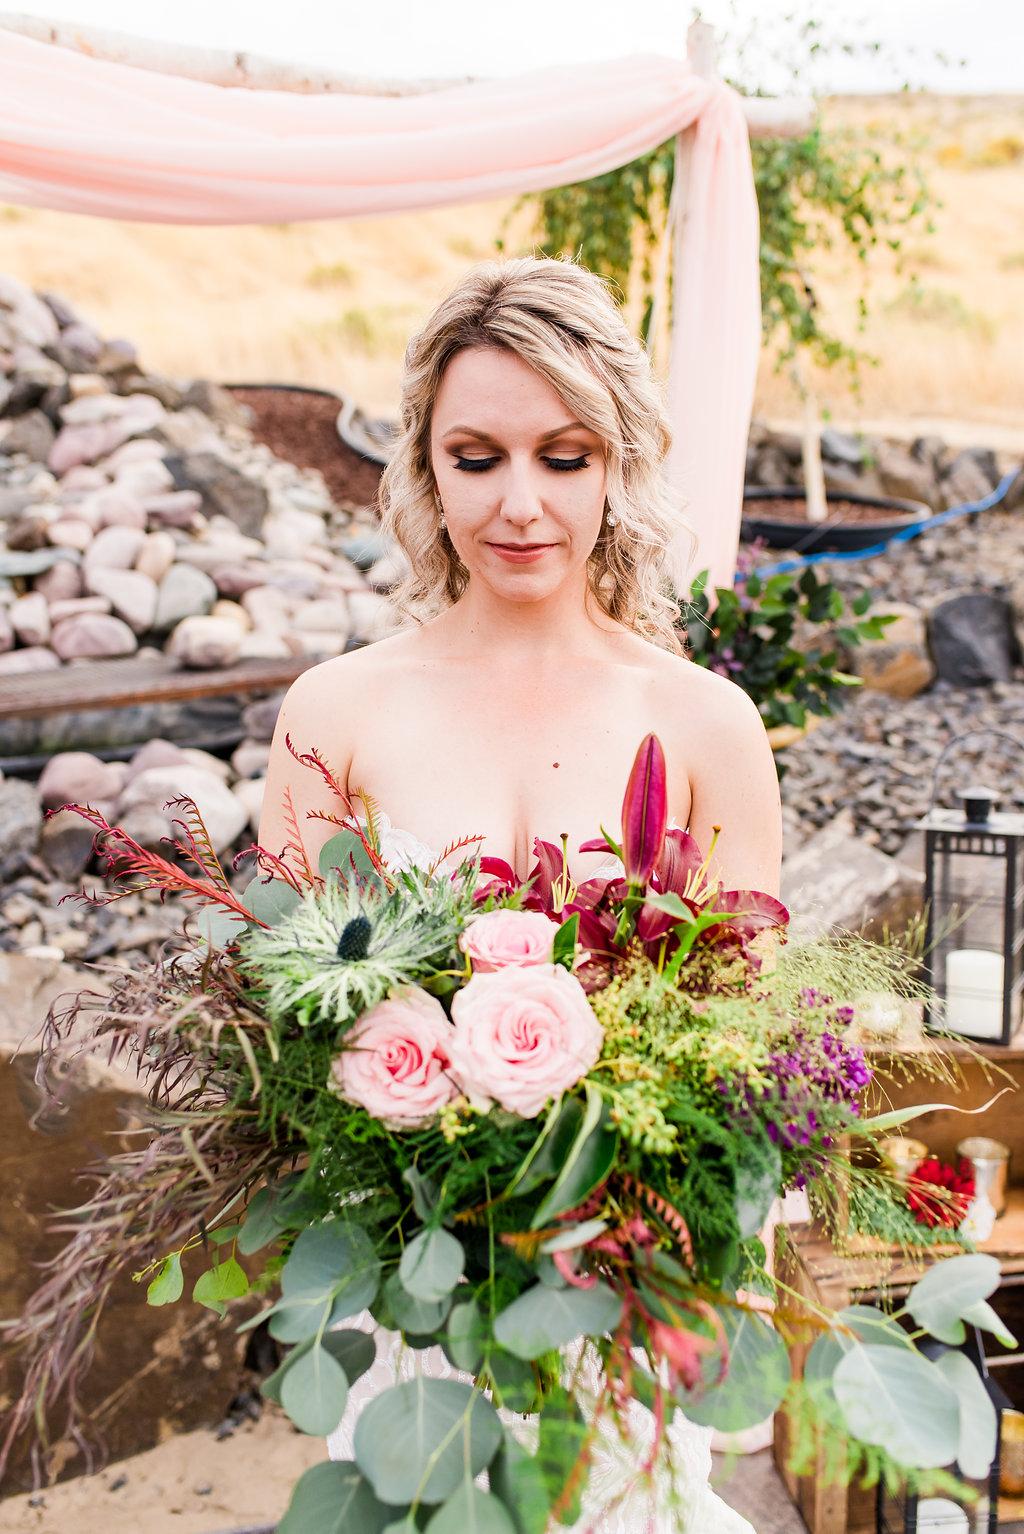 509Bride_the 509 Bride_Morgan Tayler Photo and design_tri cities photographer_18